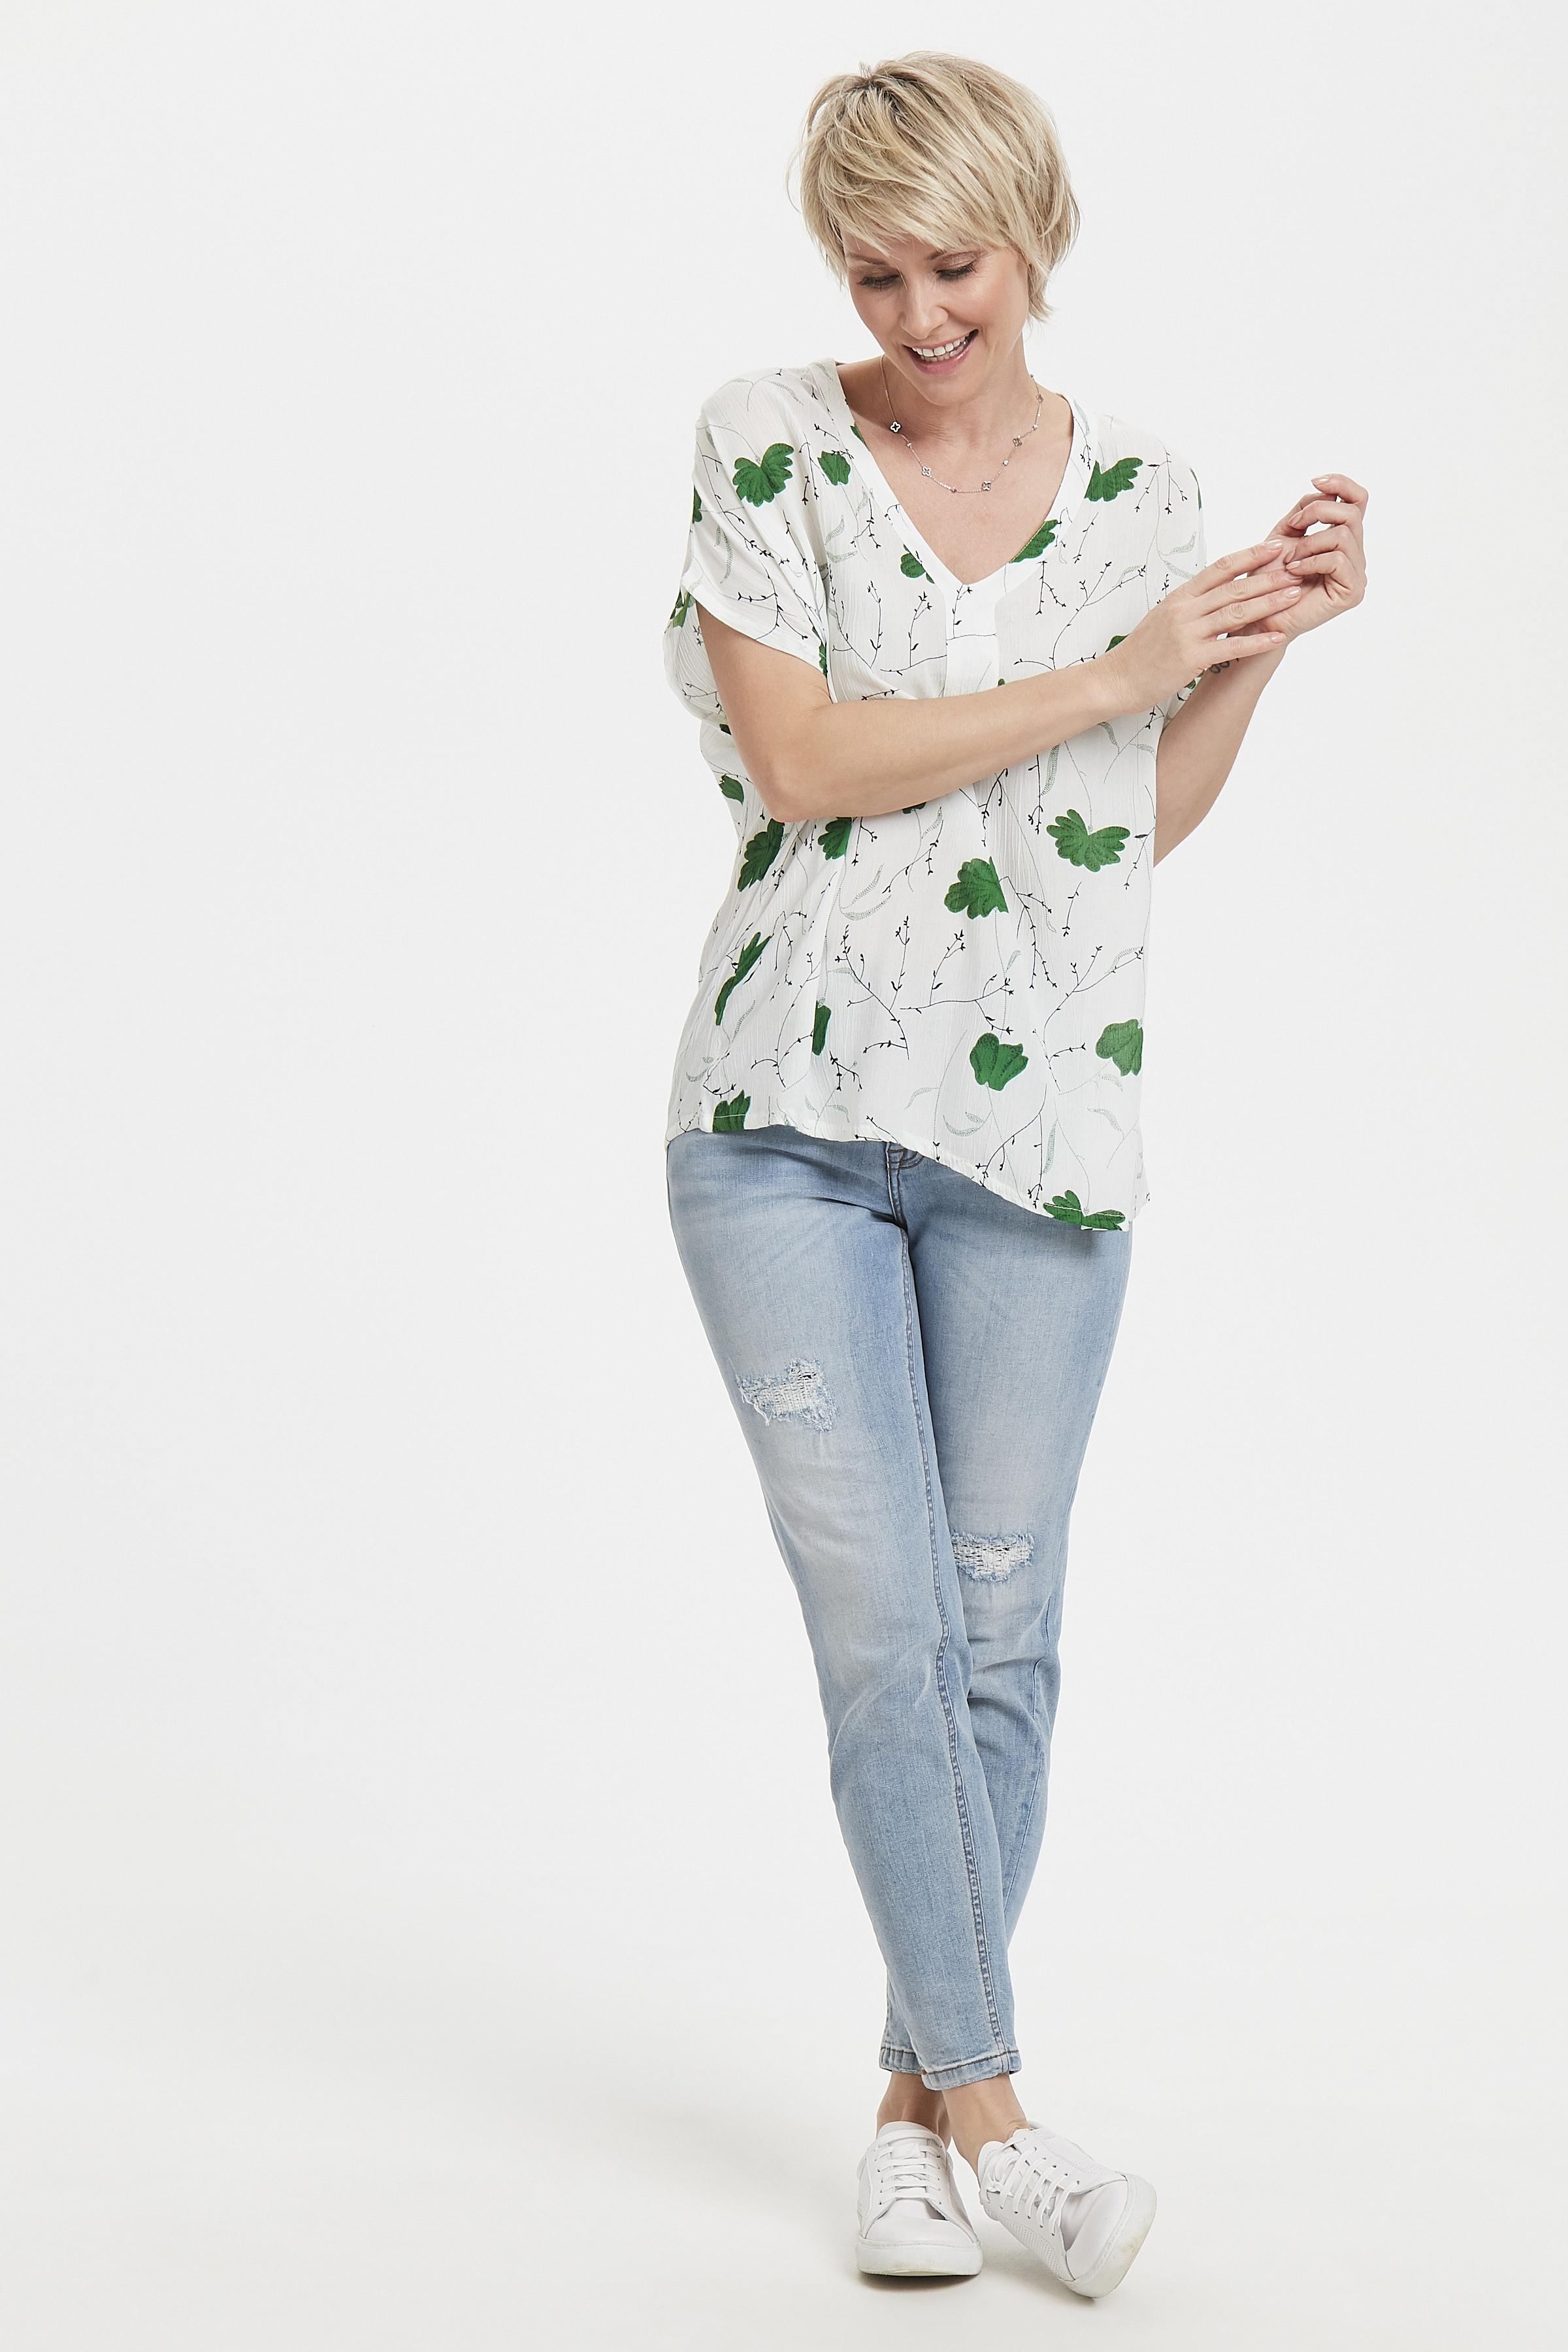 Wit/groen Blouse met korte mouwen van Kaffe – Door Wit/groen Blouse met korte mouwen van maat. 34-46 hier